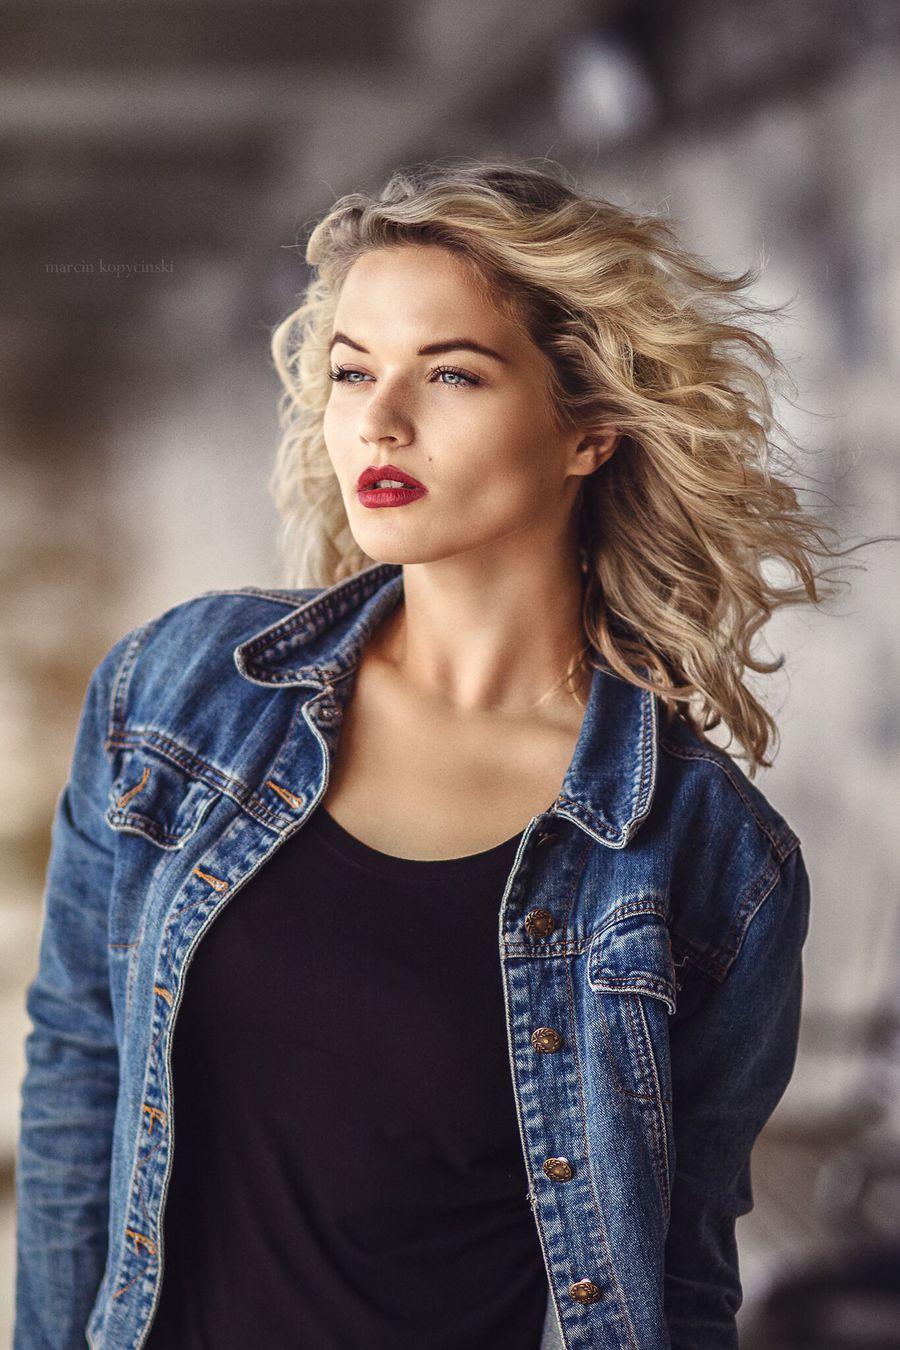 Radio Girl / Photography by Marcin K, Model Jessica Megan / Uploaded 1st December 2016 @ 09:00 PM